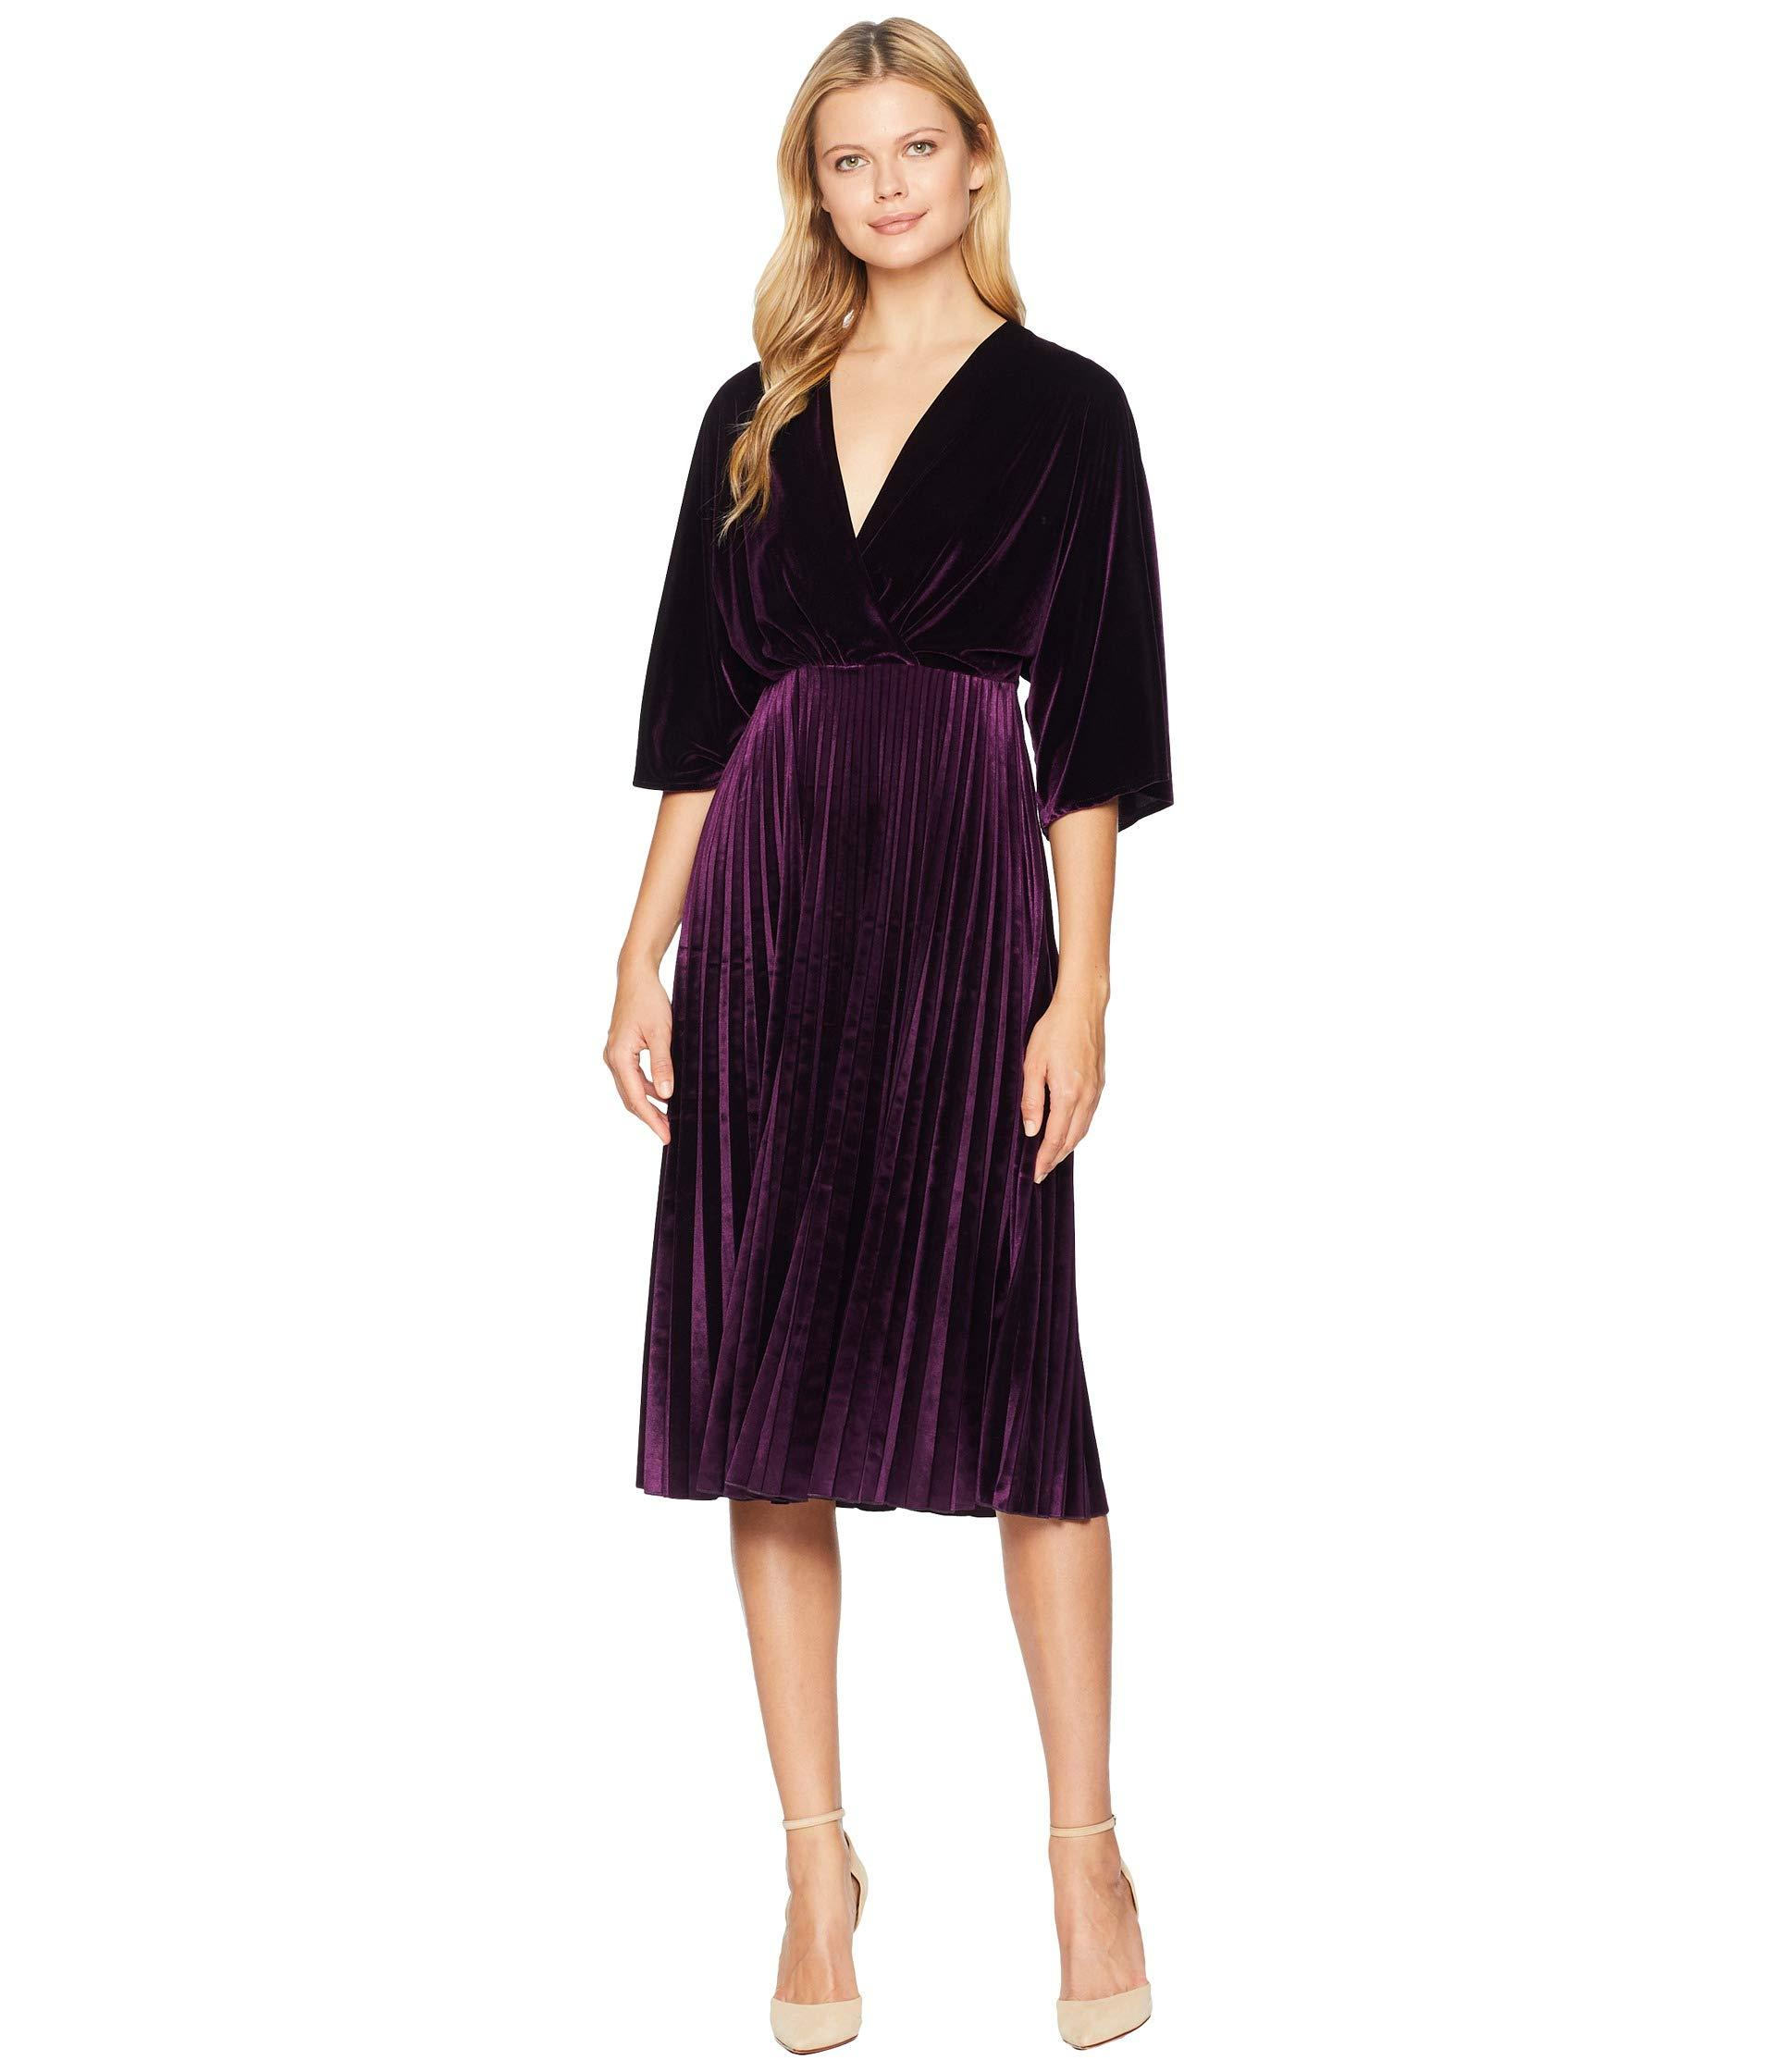 9a440cdc156 Maggy London. Women s Purple Stretch Velvet Kimono Sleeve Pleated Dress